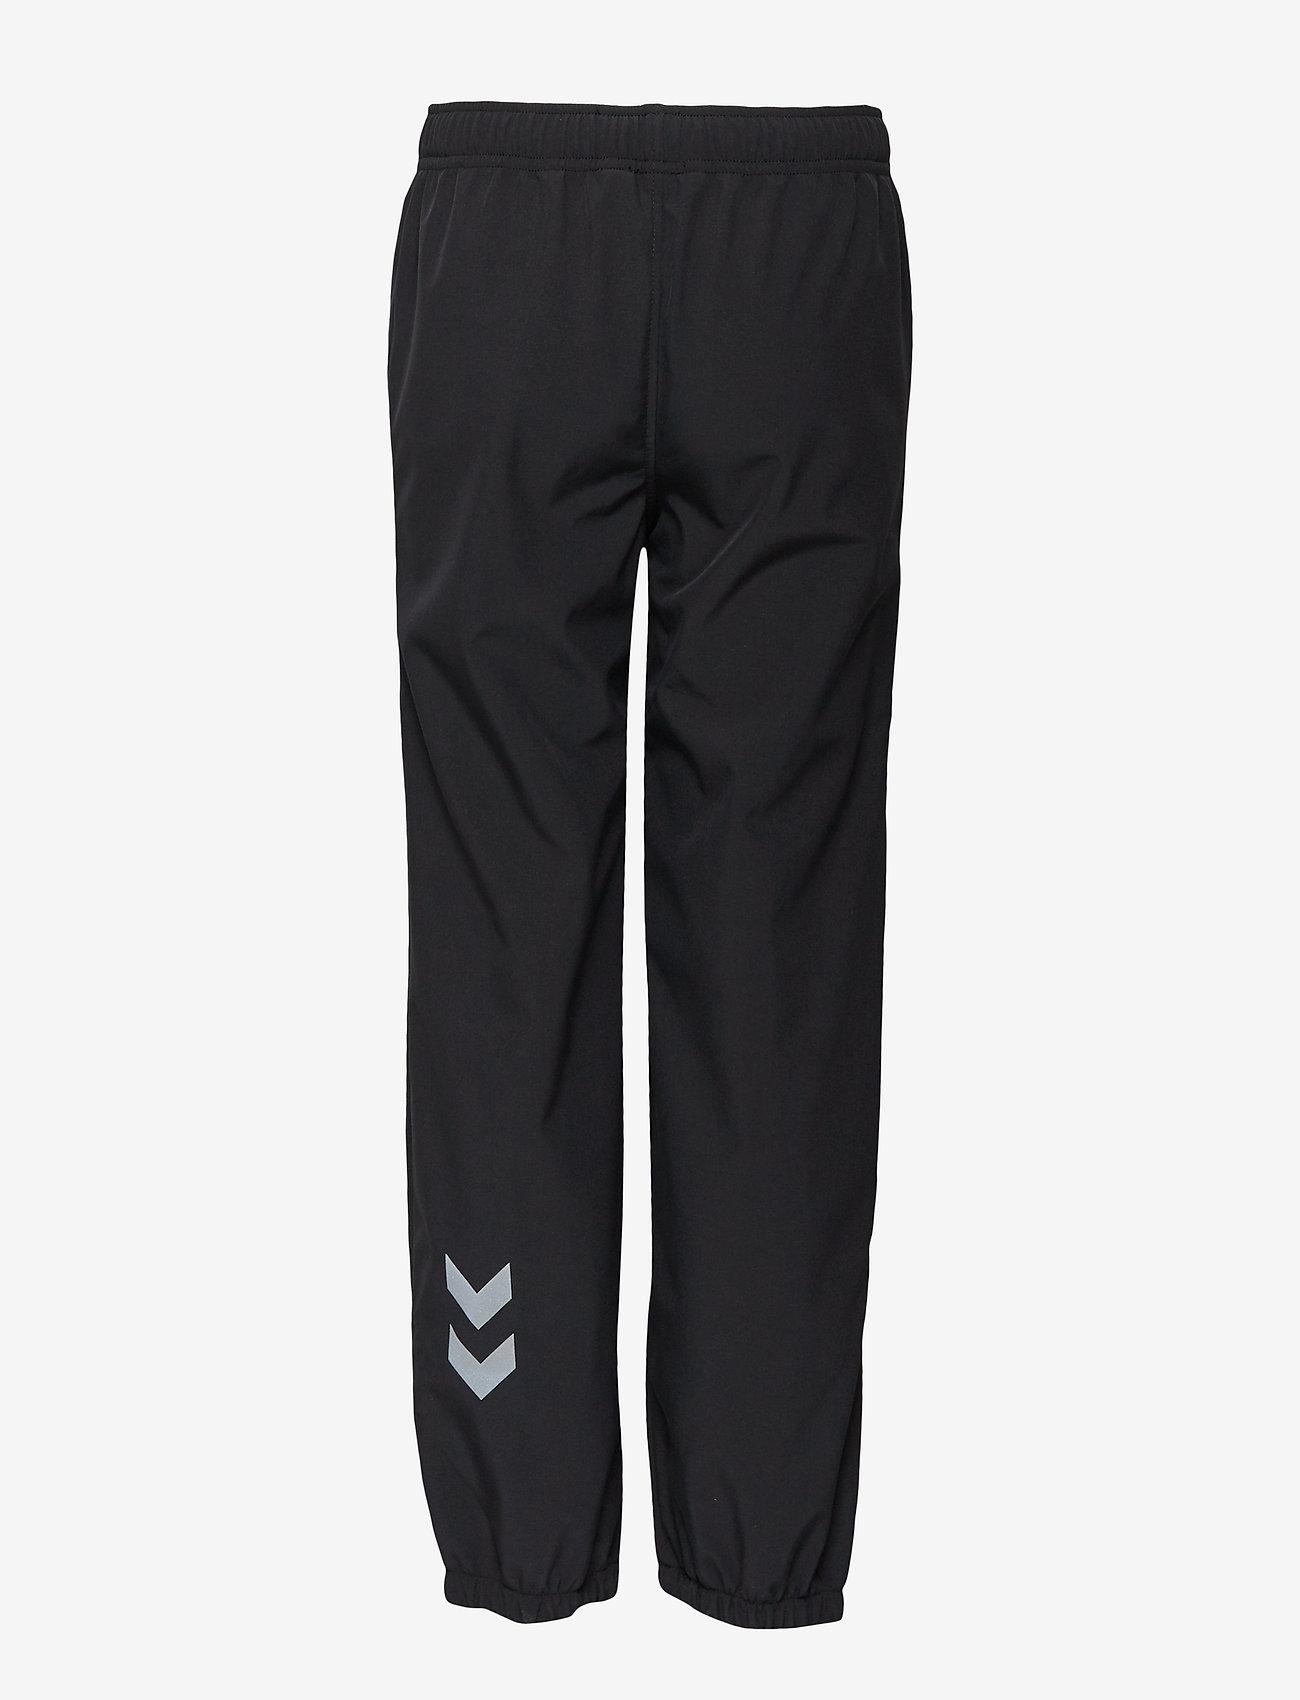 Hummel - HMLRENE PANTS - softshell pants - black - 1